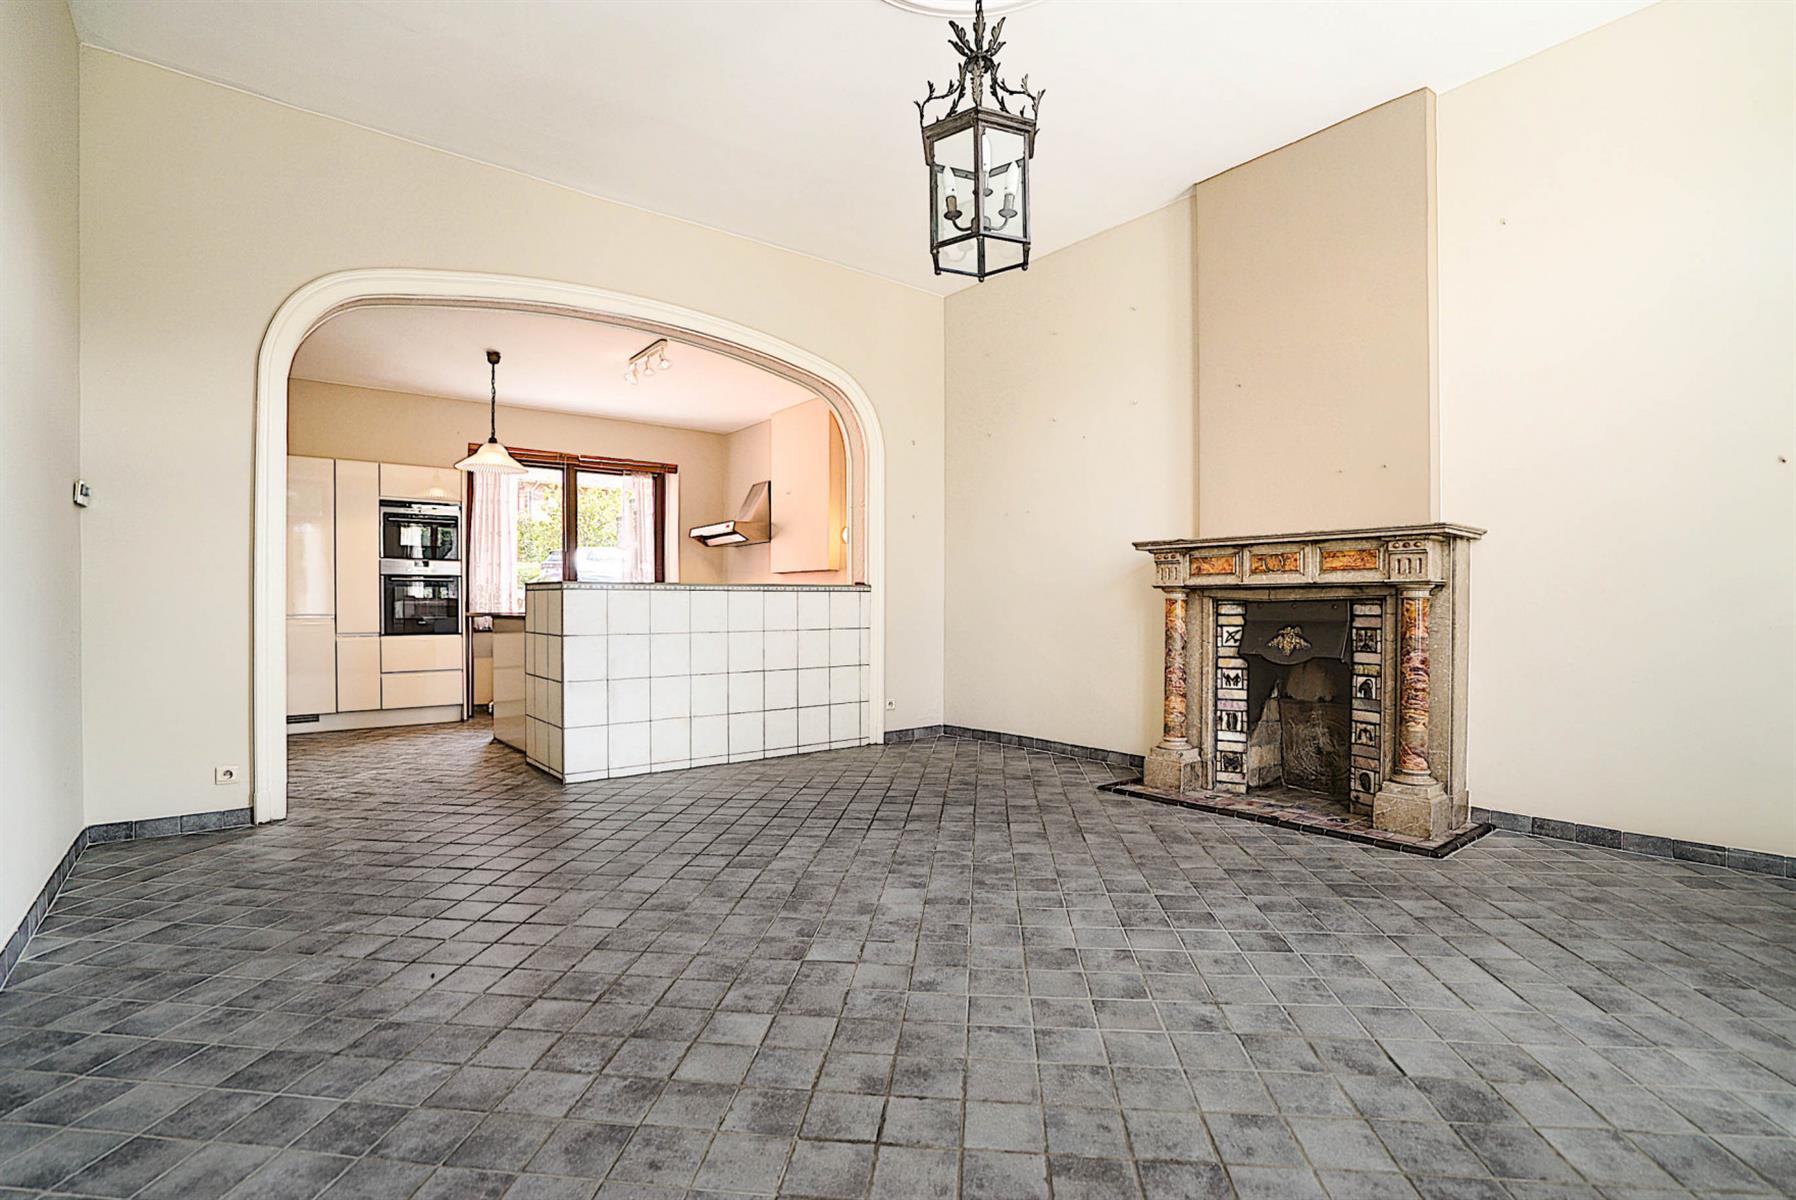 Maison - Bousval - #4131618-5